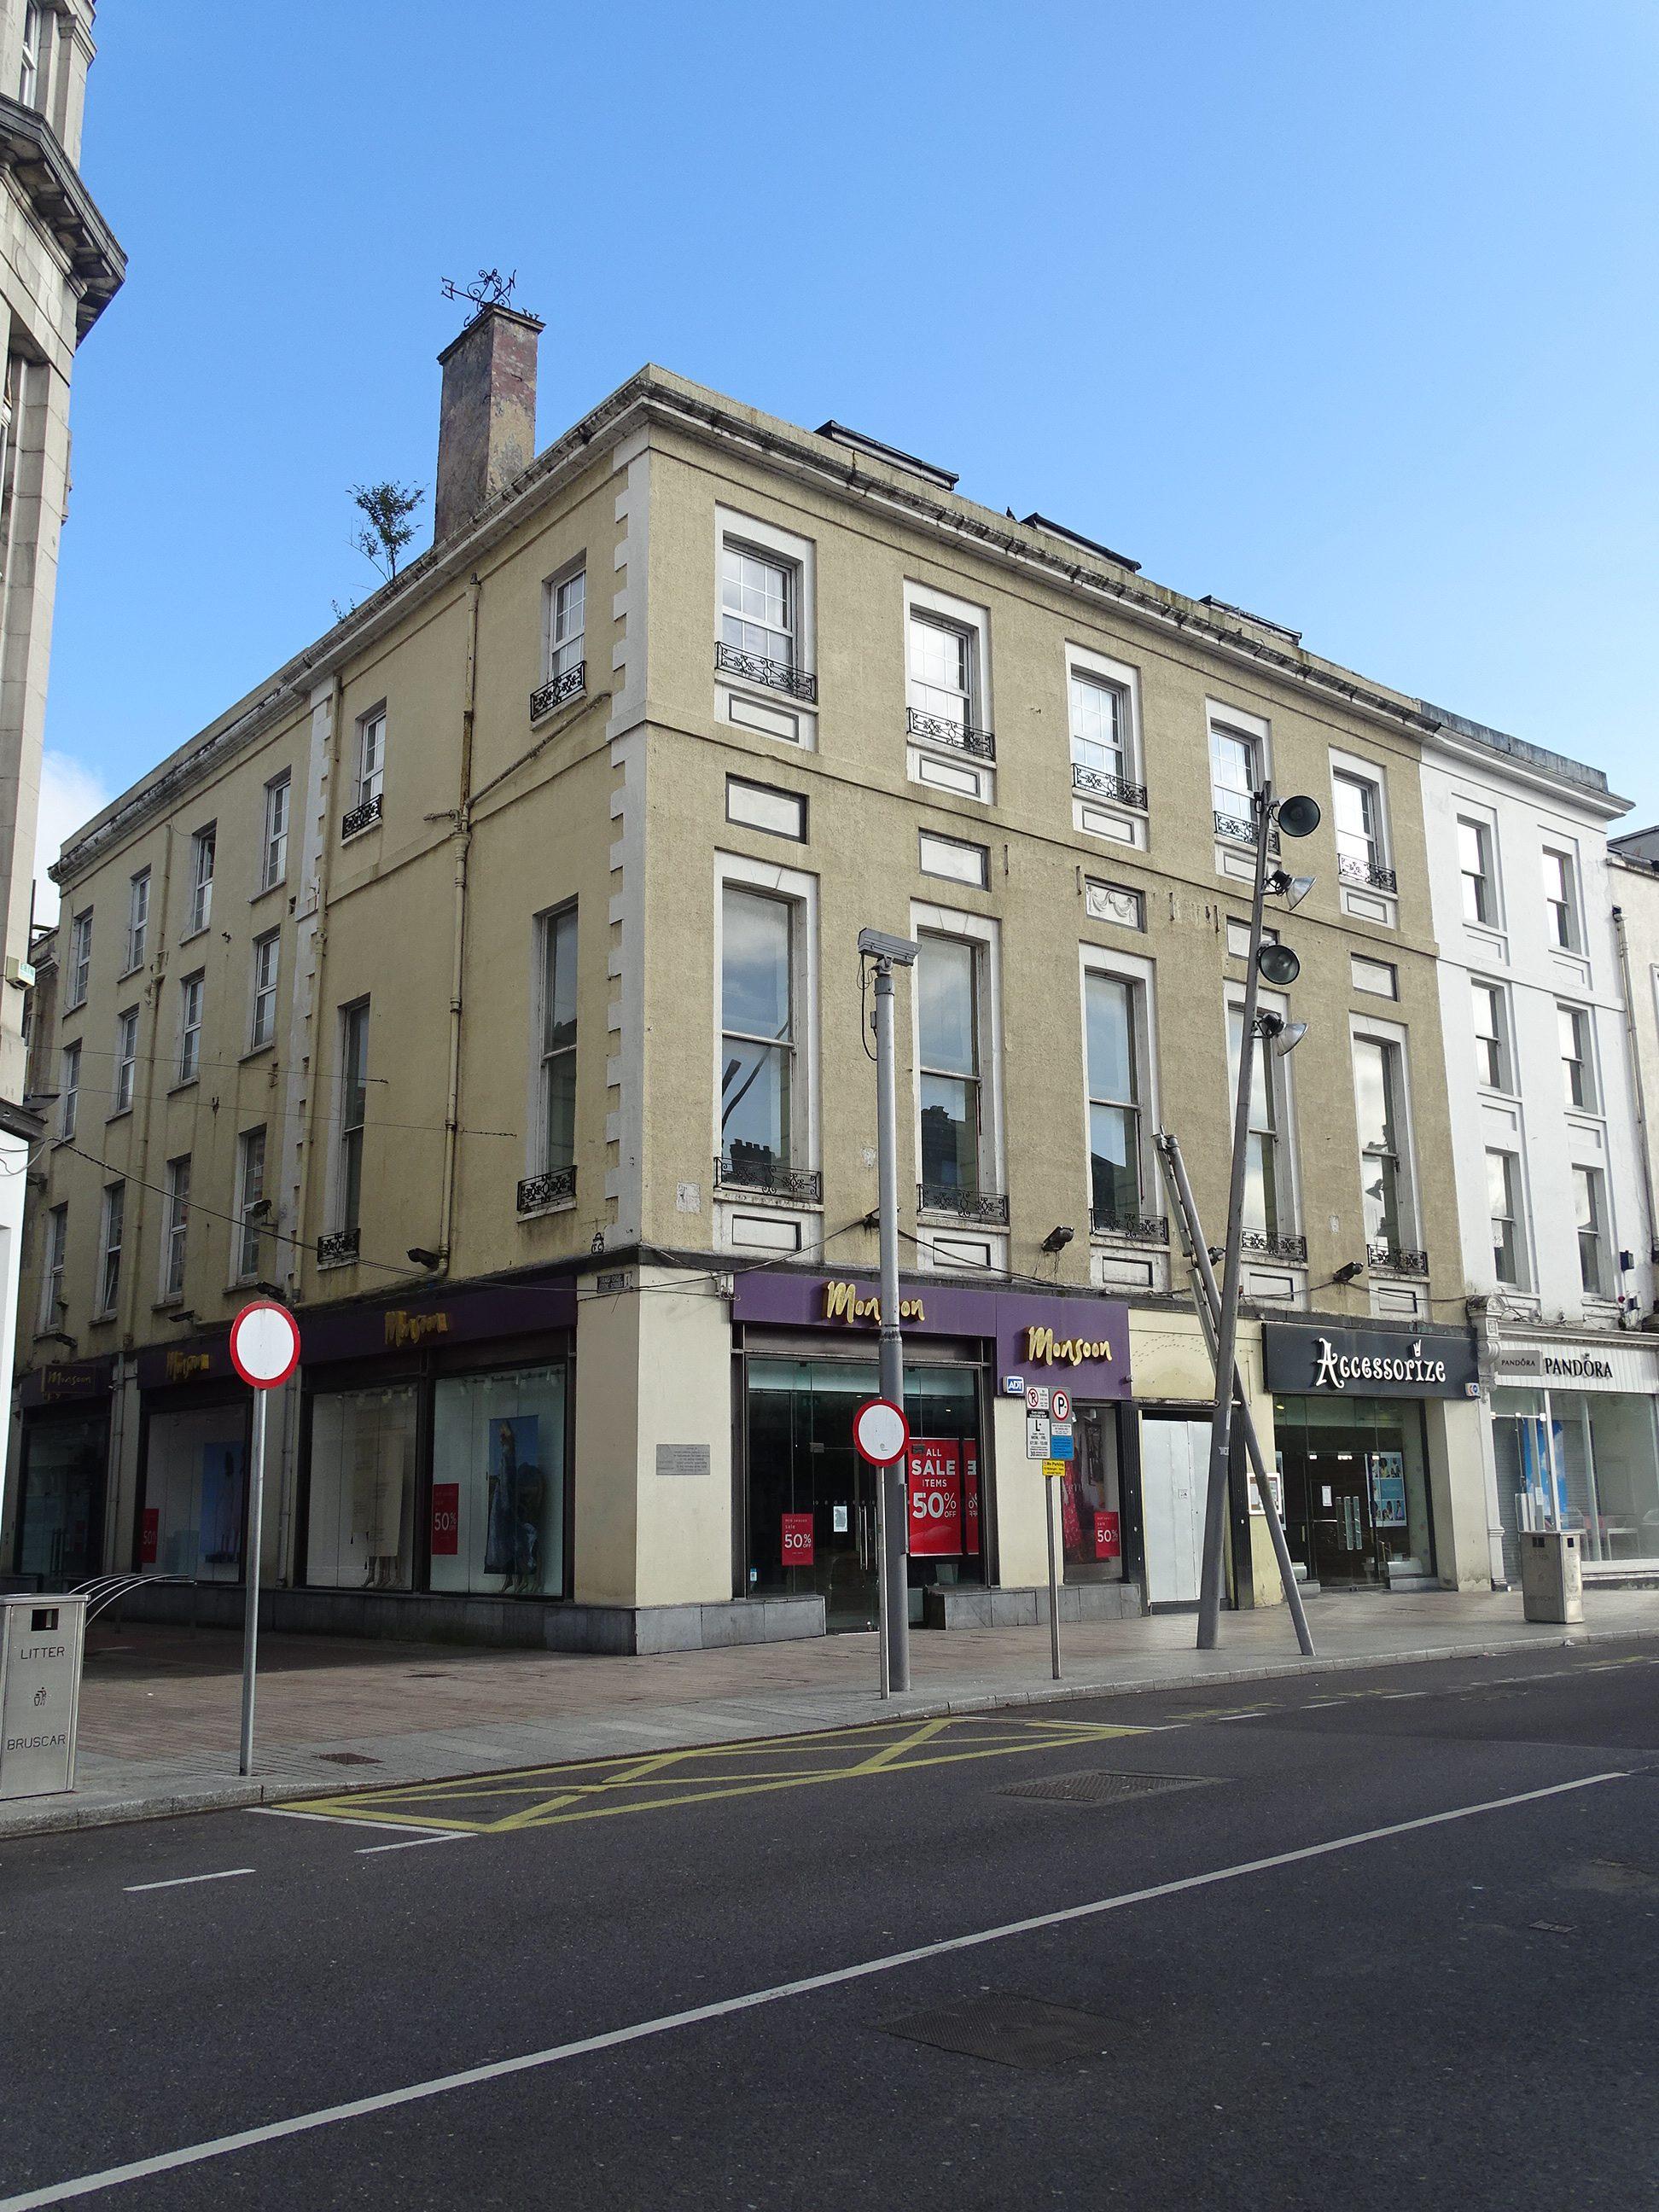 Former site of Victoria Hotel, St Patrick's Street, Cork, present day (picture: Kieran McCarthy)